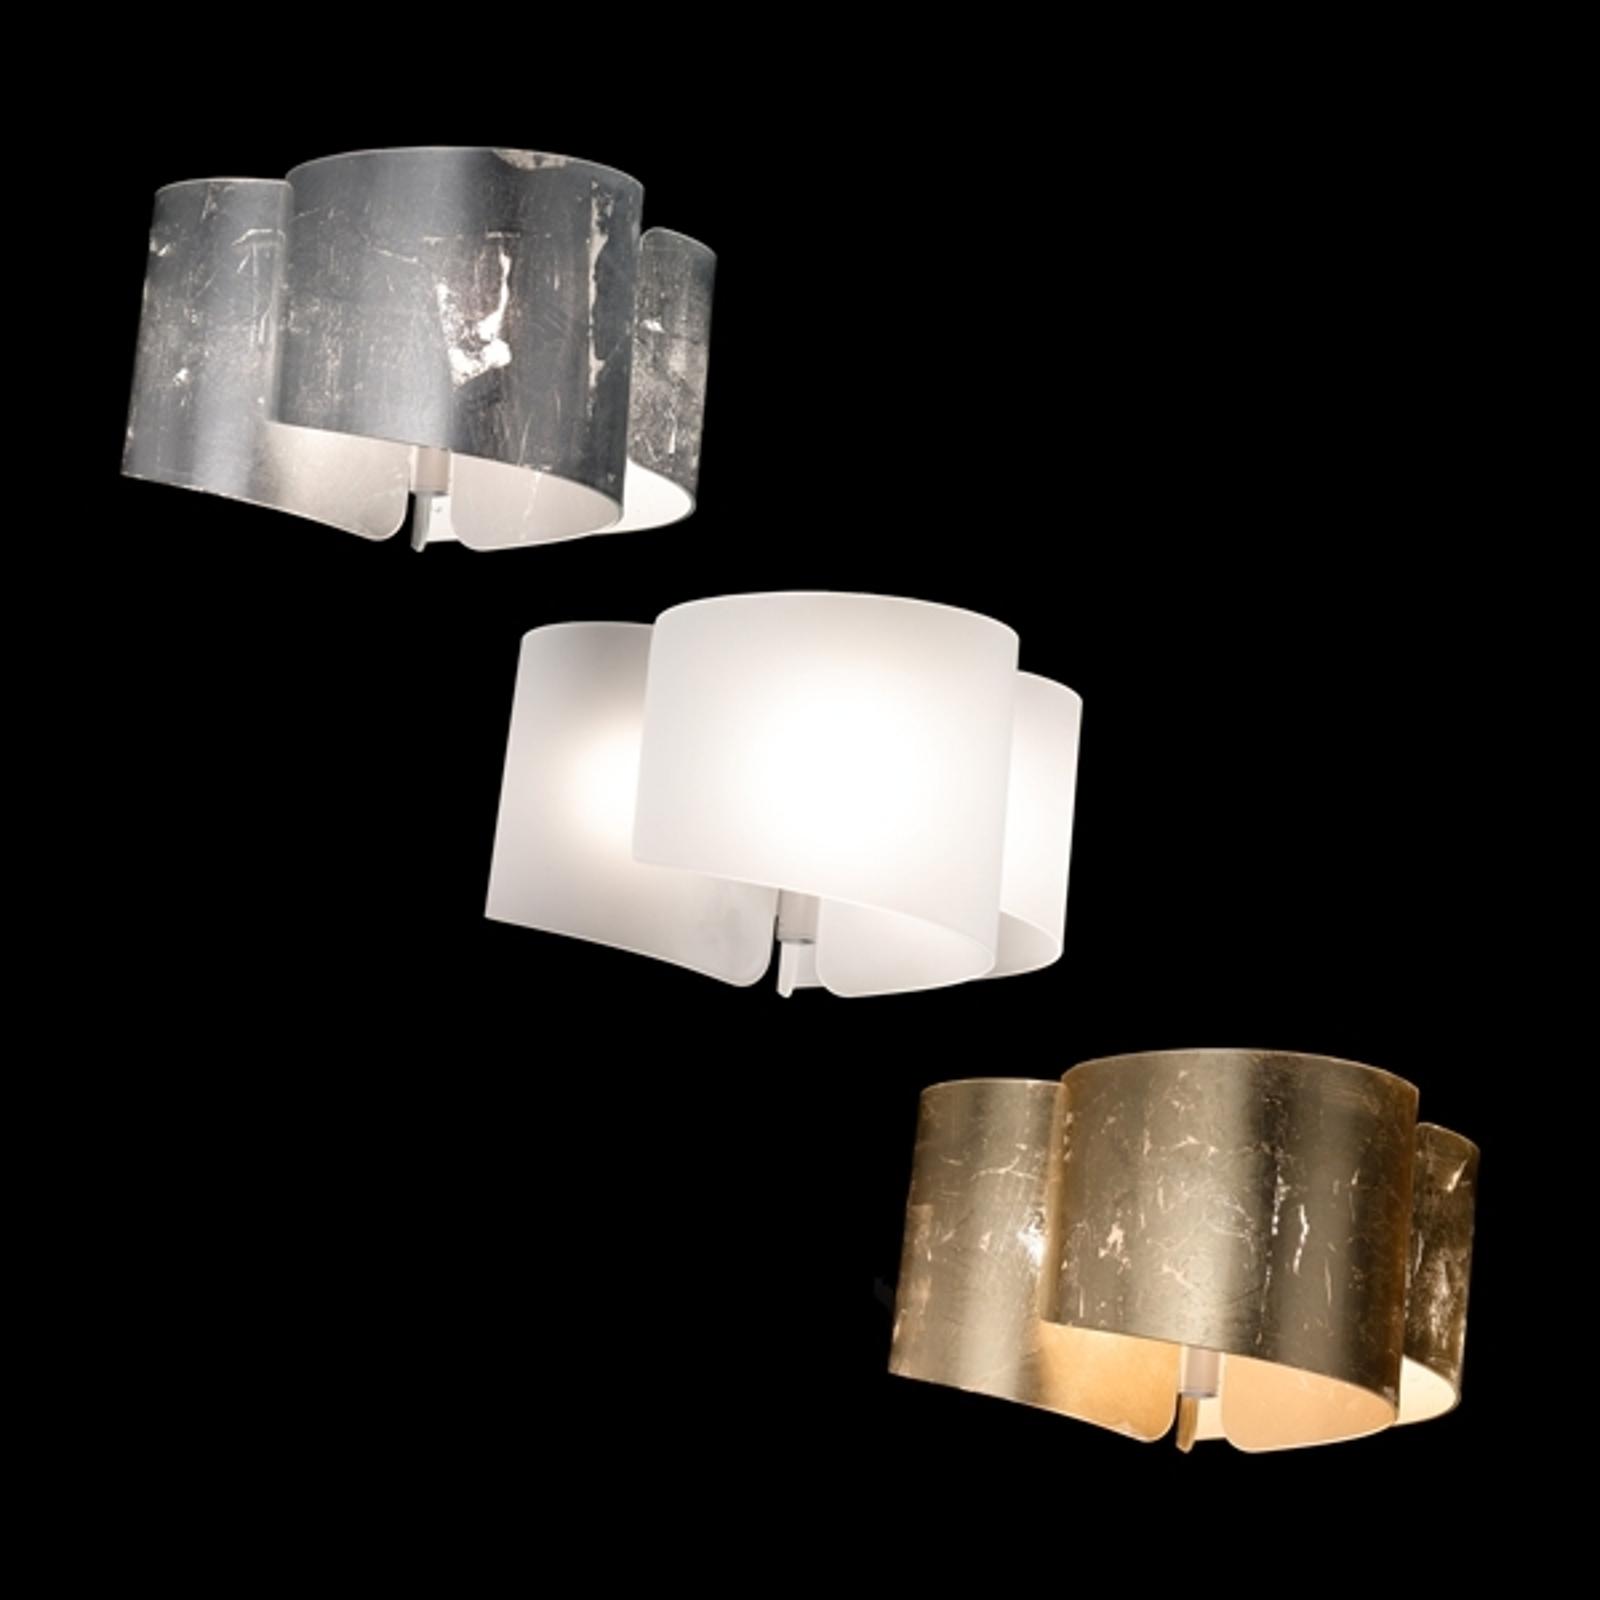 Efektowna lampa sufitowa Papiro satynowa